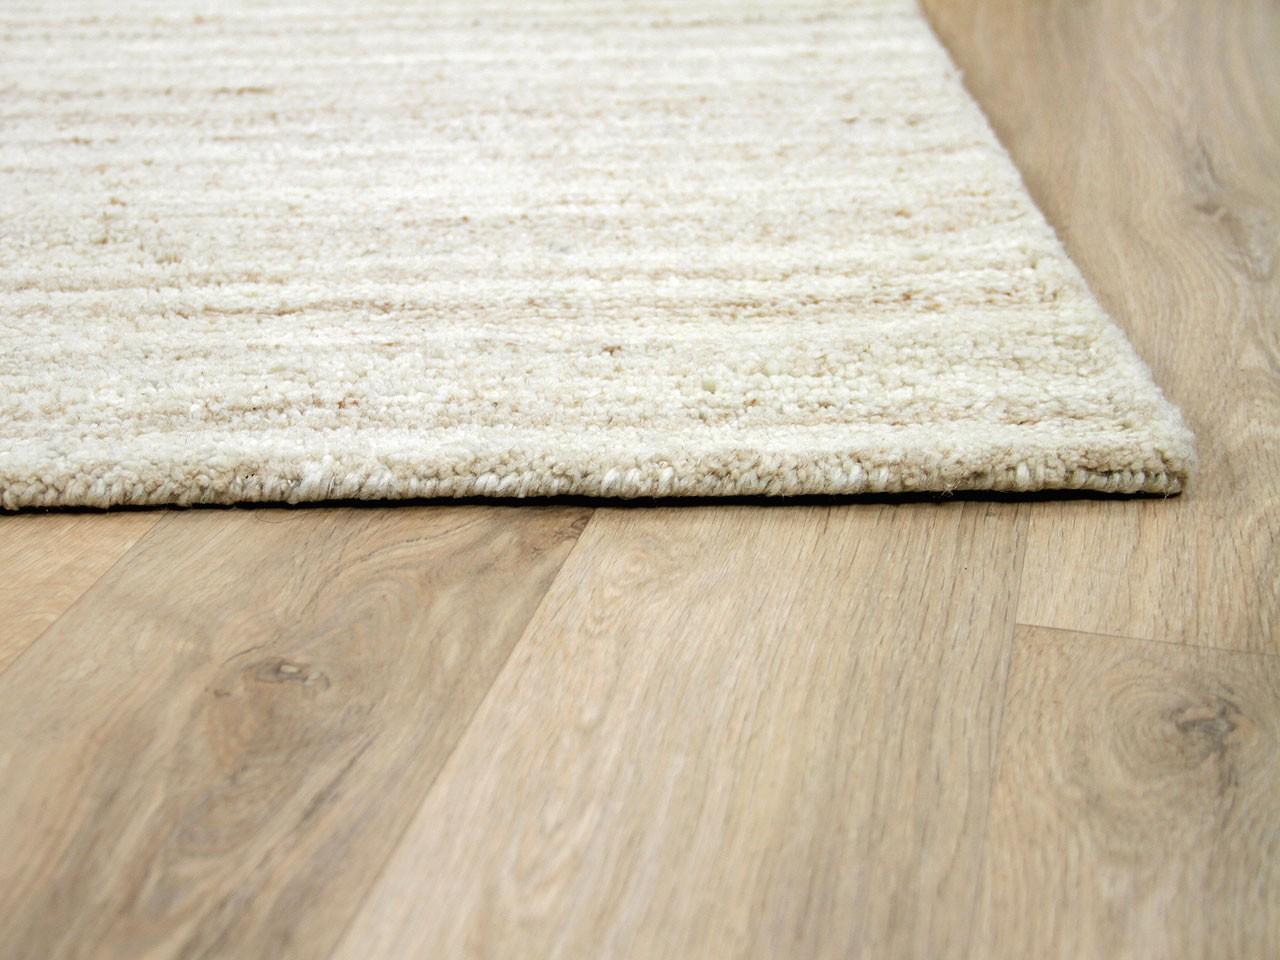 natur teppich berber aruna beige melange teppiche sisal. Black Bedroom Furniture Sets. Home Design Ideas